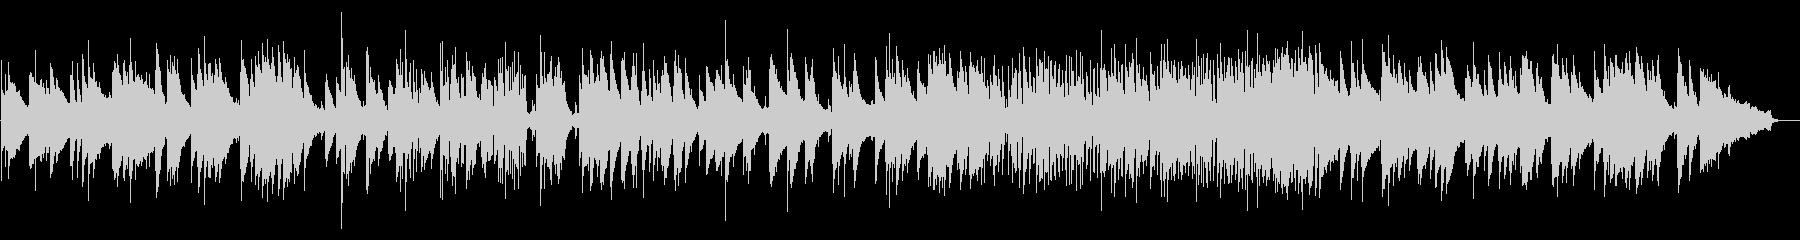 Gershwin's Jazz Waltz's unreproduced waveform